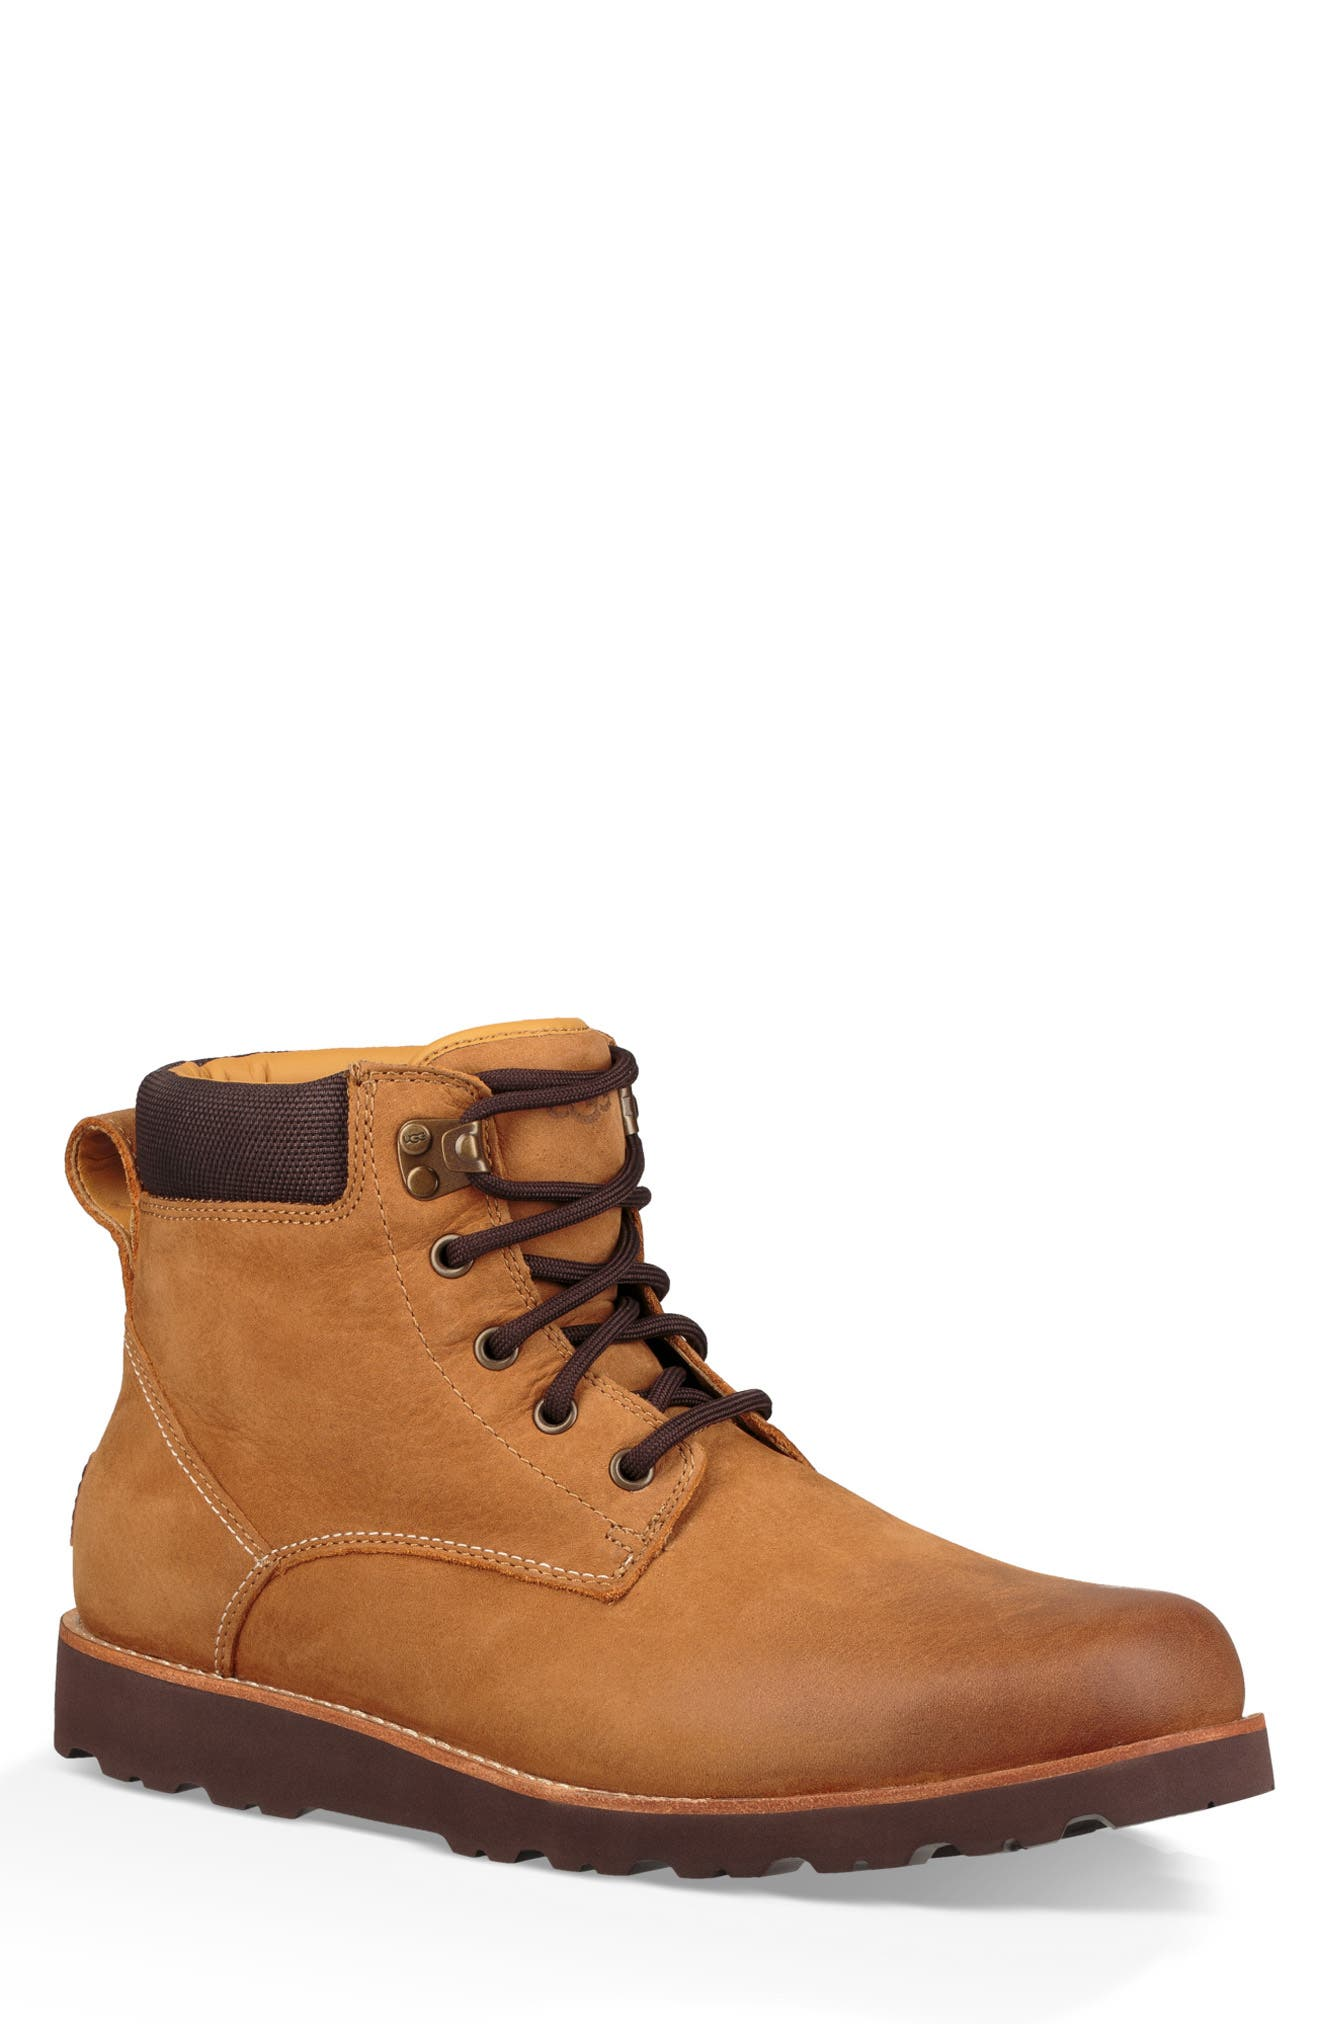 Seton Waterproof Chukka Boot,                         Main,                         color, WHEAT